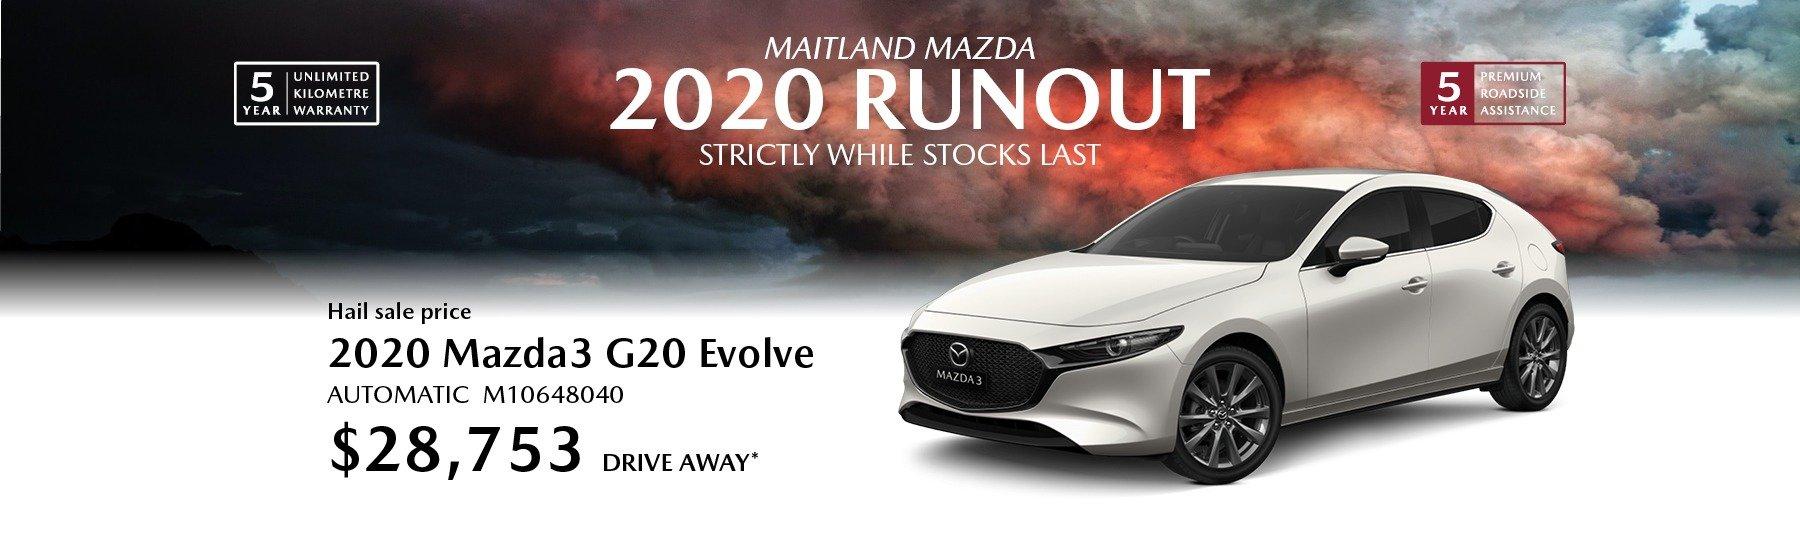 Mazda 2020 runout